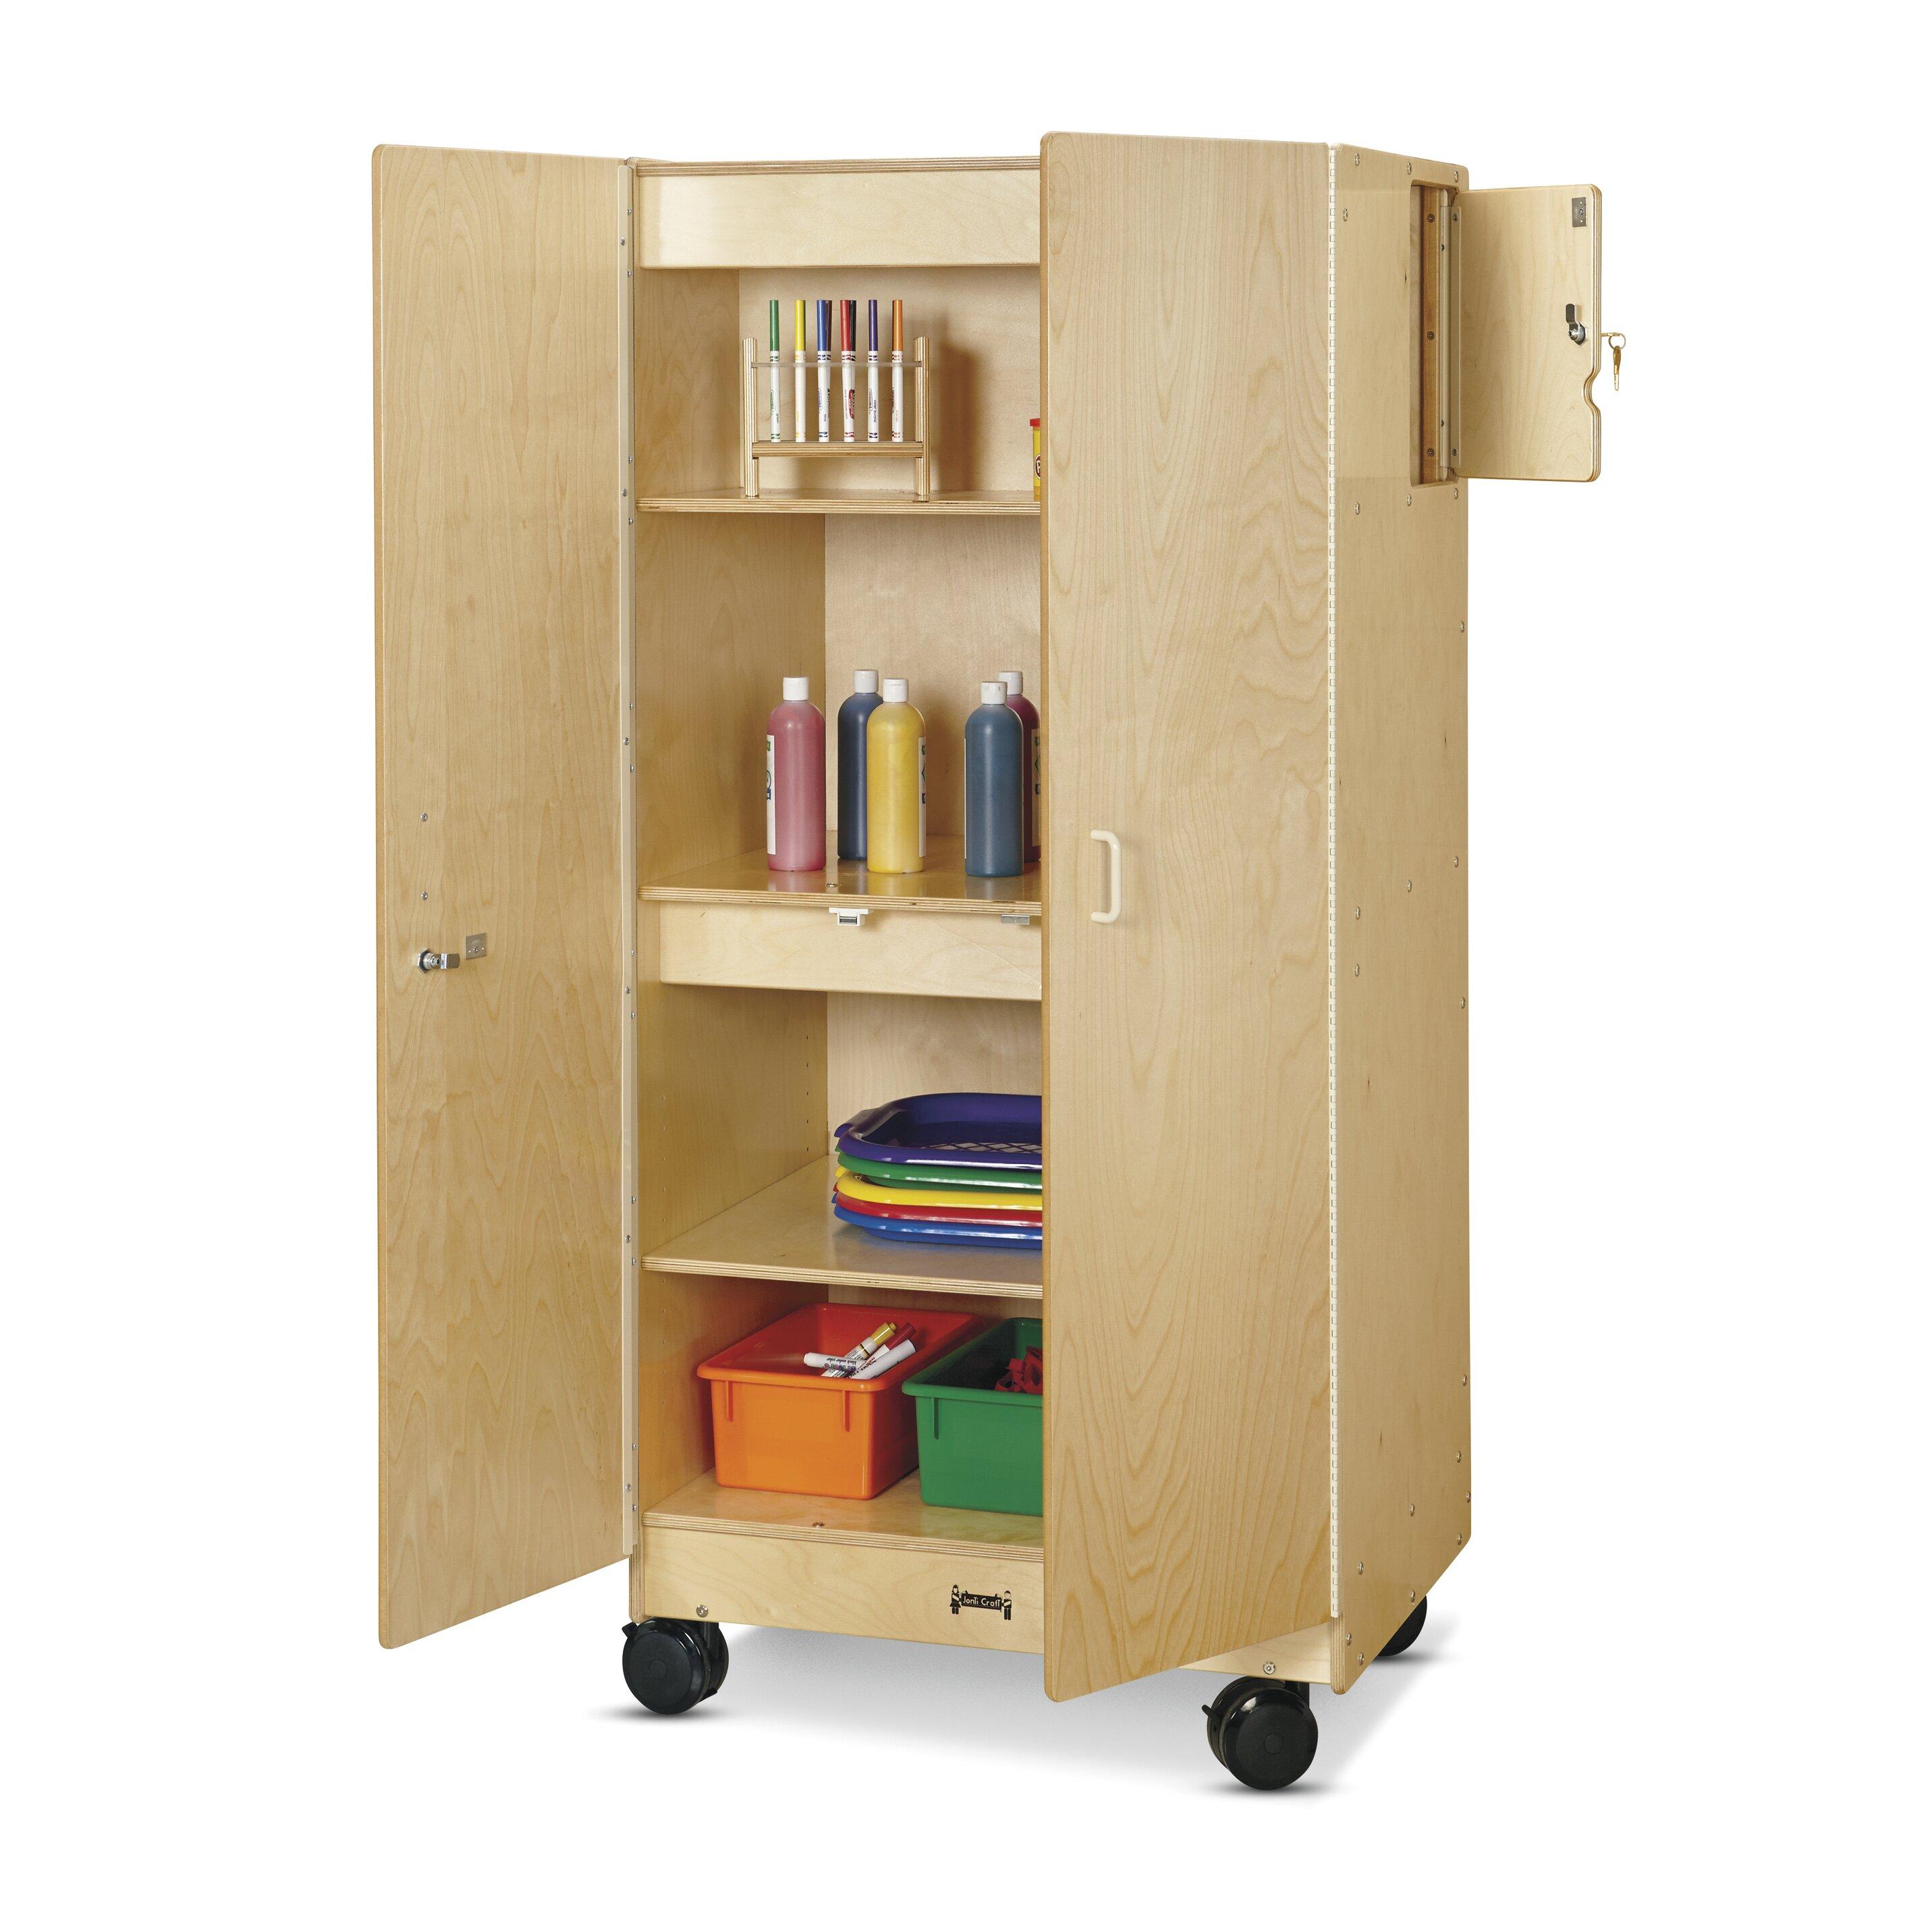 Kitchen Craft Cabinet Sizes: Jonti-Craft Hideaway Mobile Classroom Cabinet